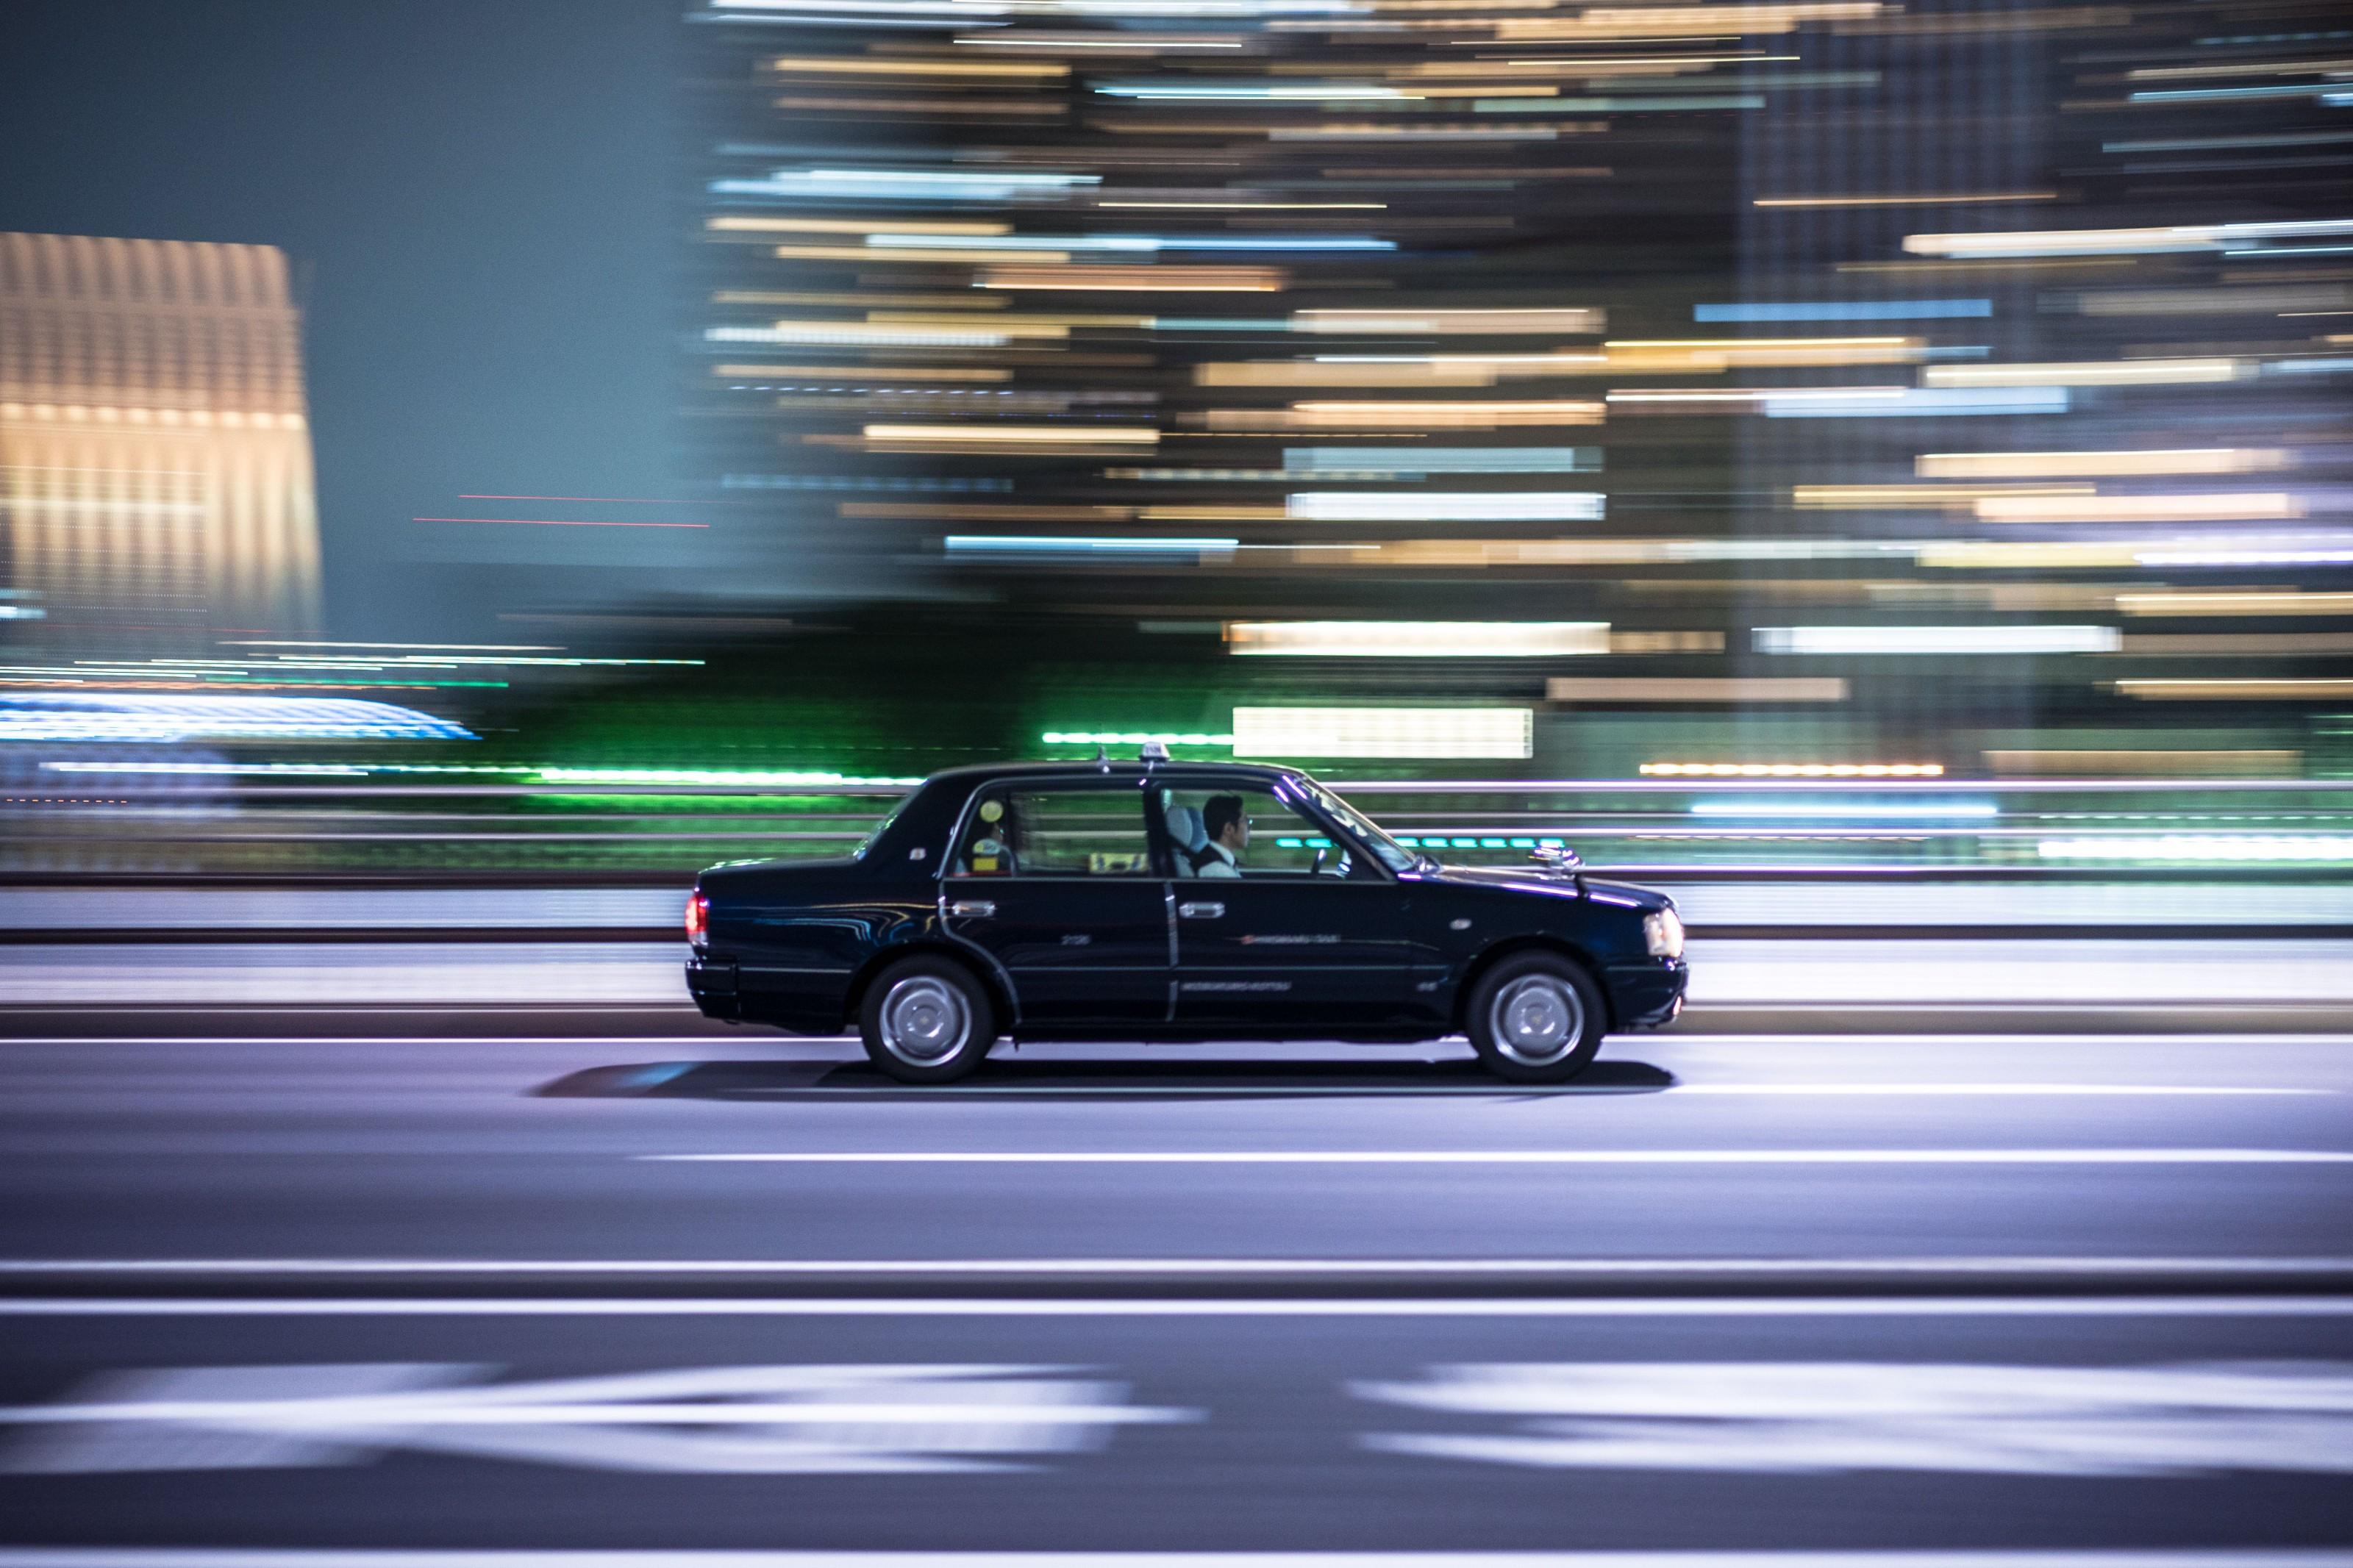 Tokio-Taxi